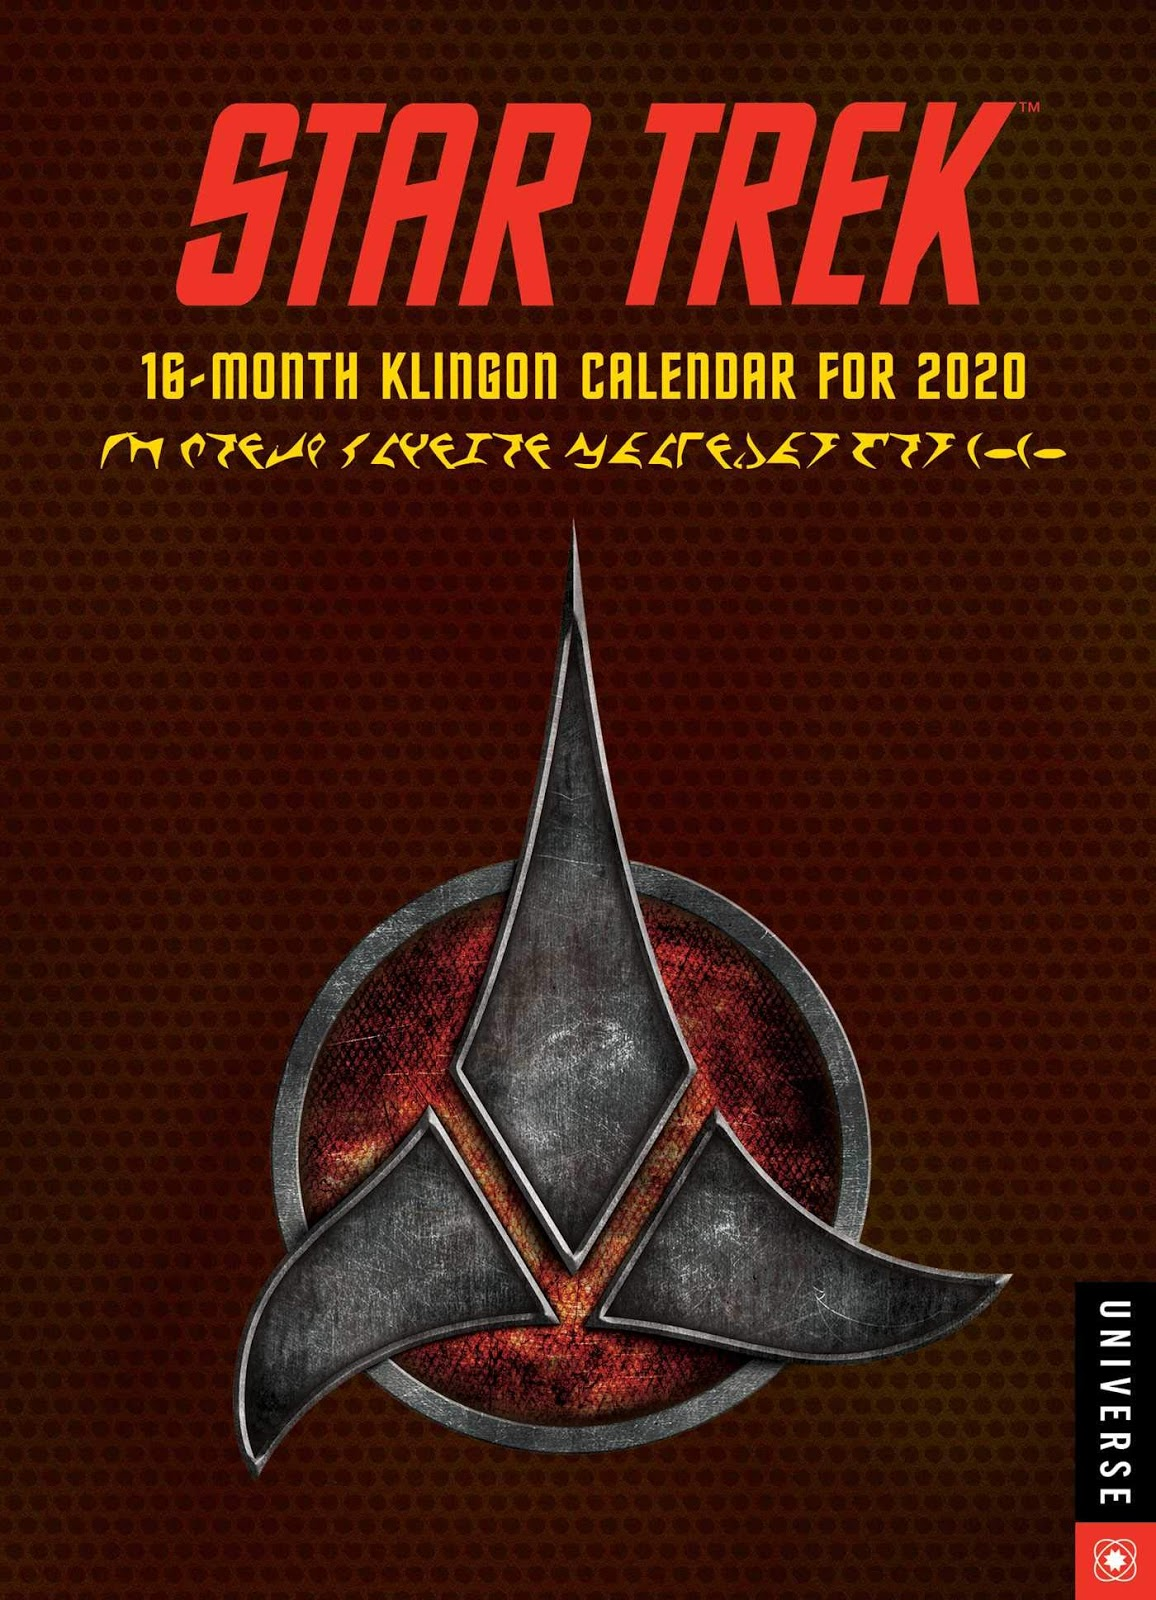 The Trek Collective: 2020 Star Trek calendar line-up revealed